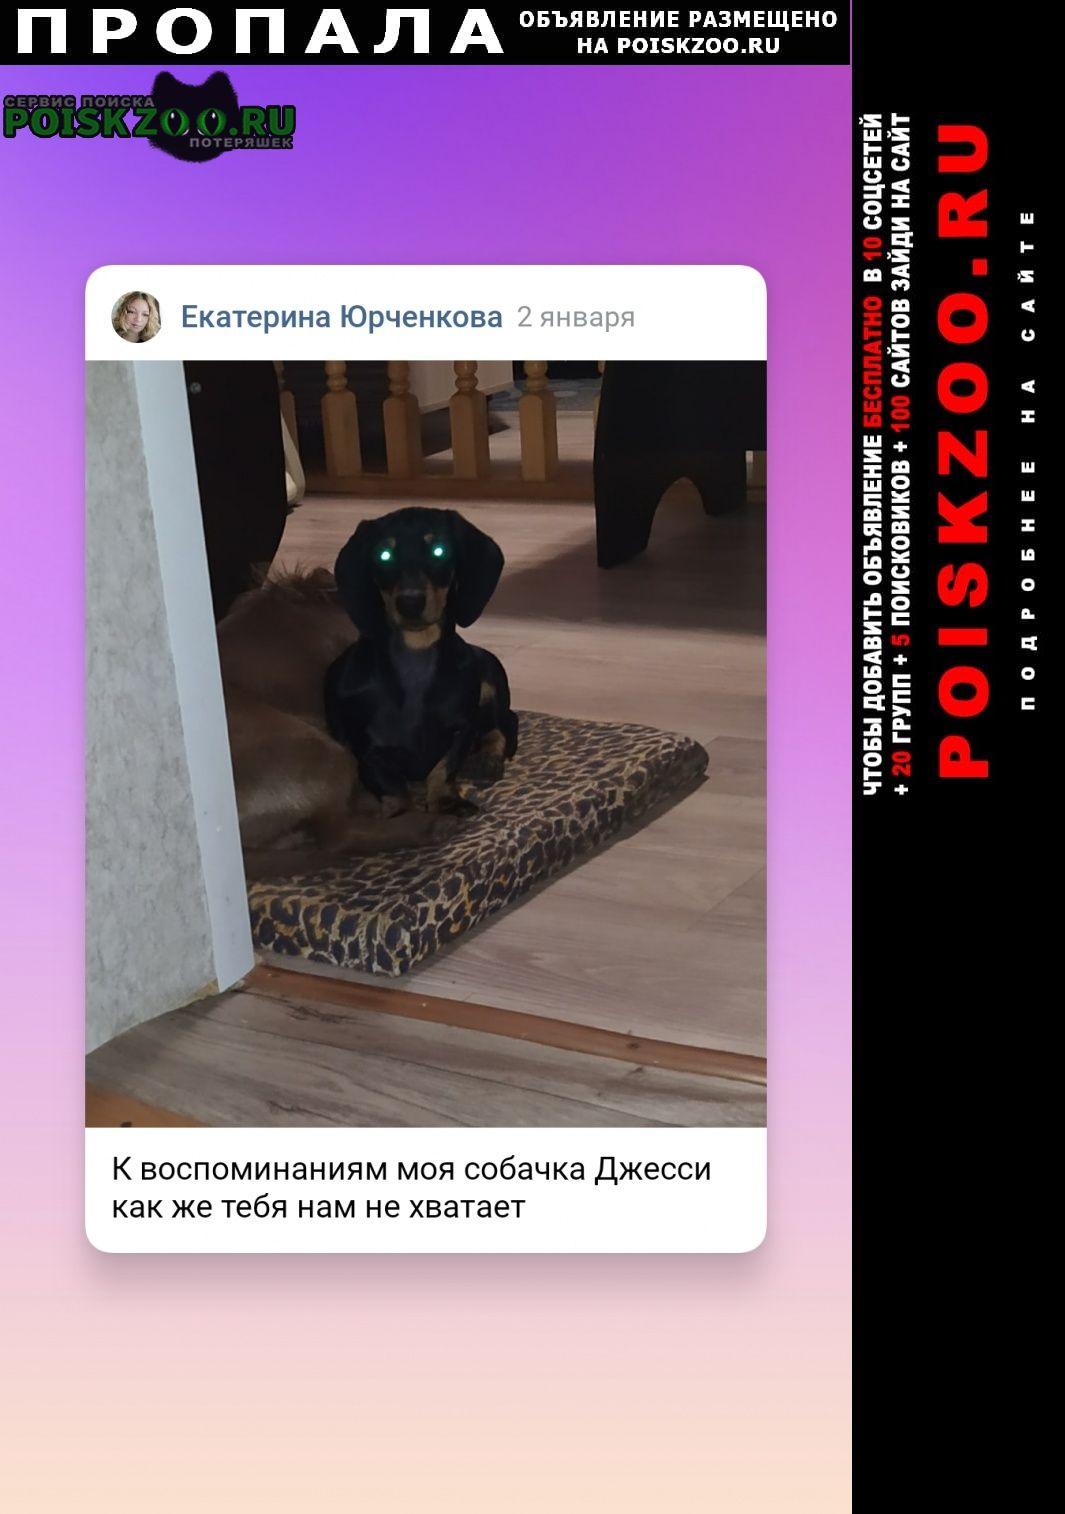 Пропала собака собачка породы такса, зовут джес Москва